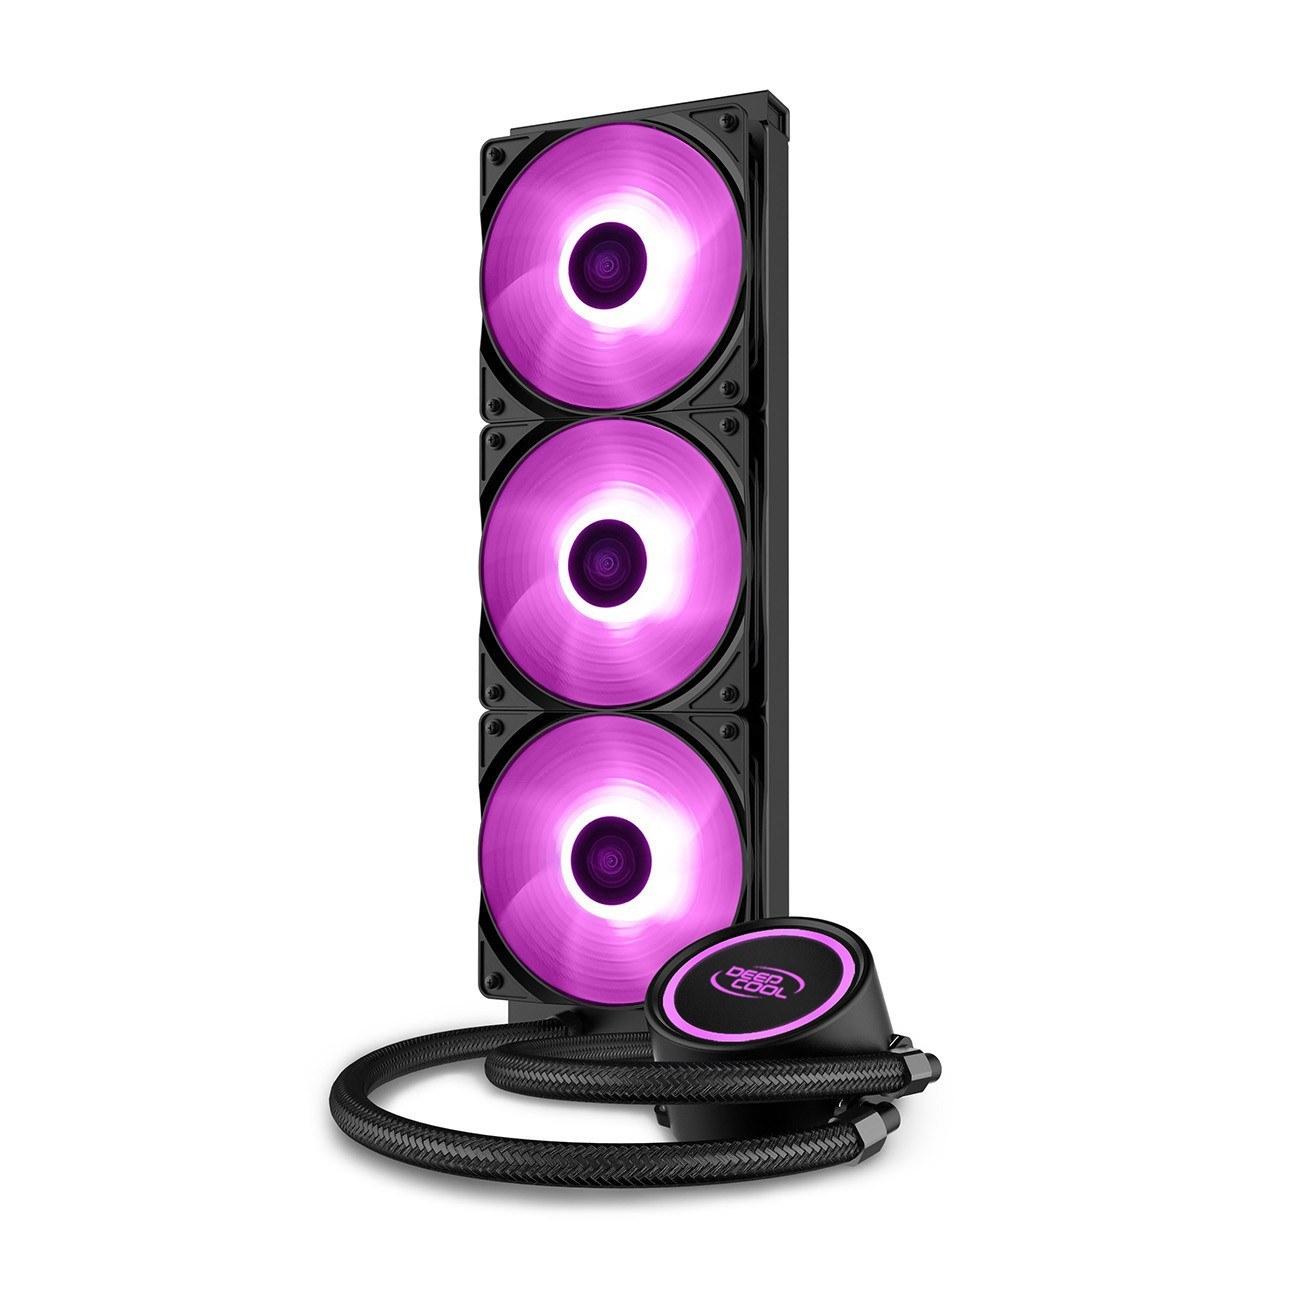 تصویر خنک کننده مایع پردازنده دیپ کول GAMMAXX L360 V2 DeepCool GAMMAXX L360 V2 RGB CPU Liquid Cooler